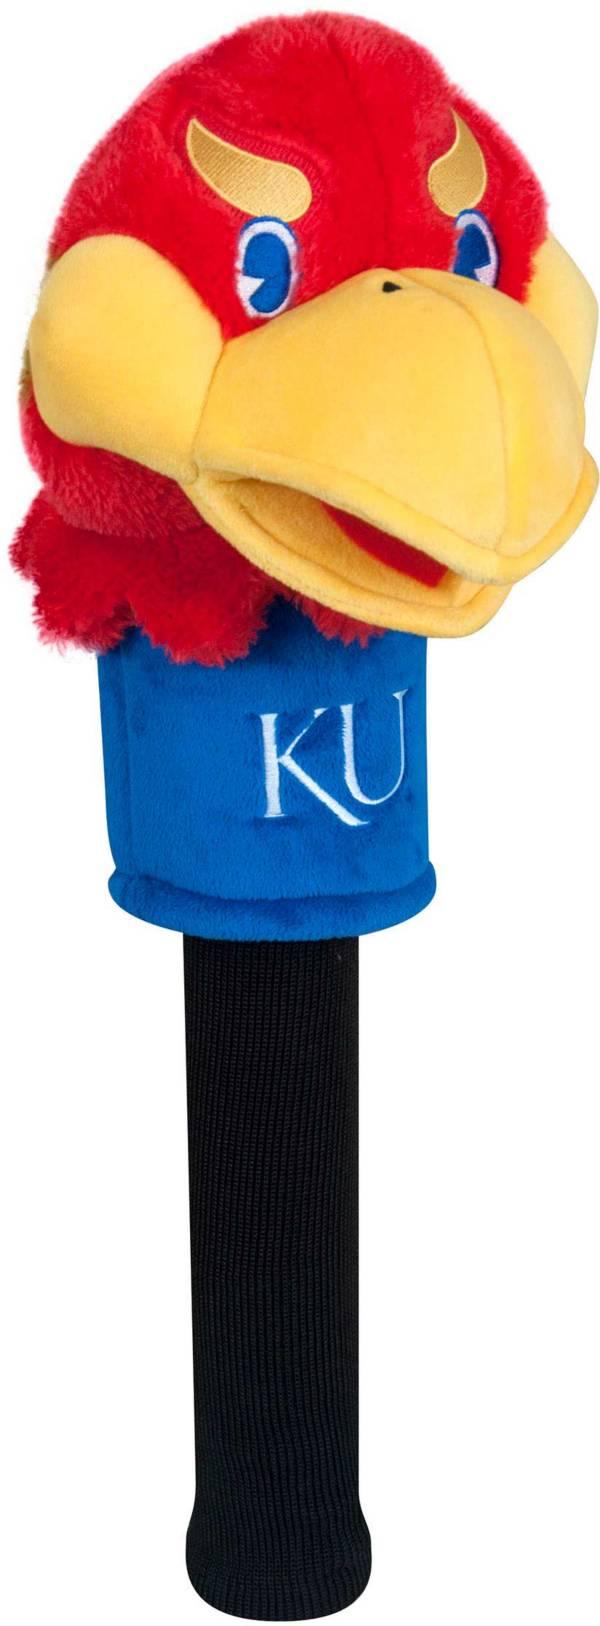 Team Effort Kansas Jayhawks Mascot Headcover product image